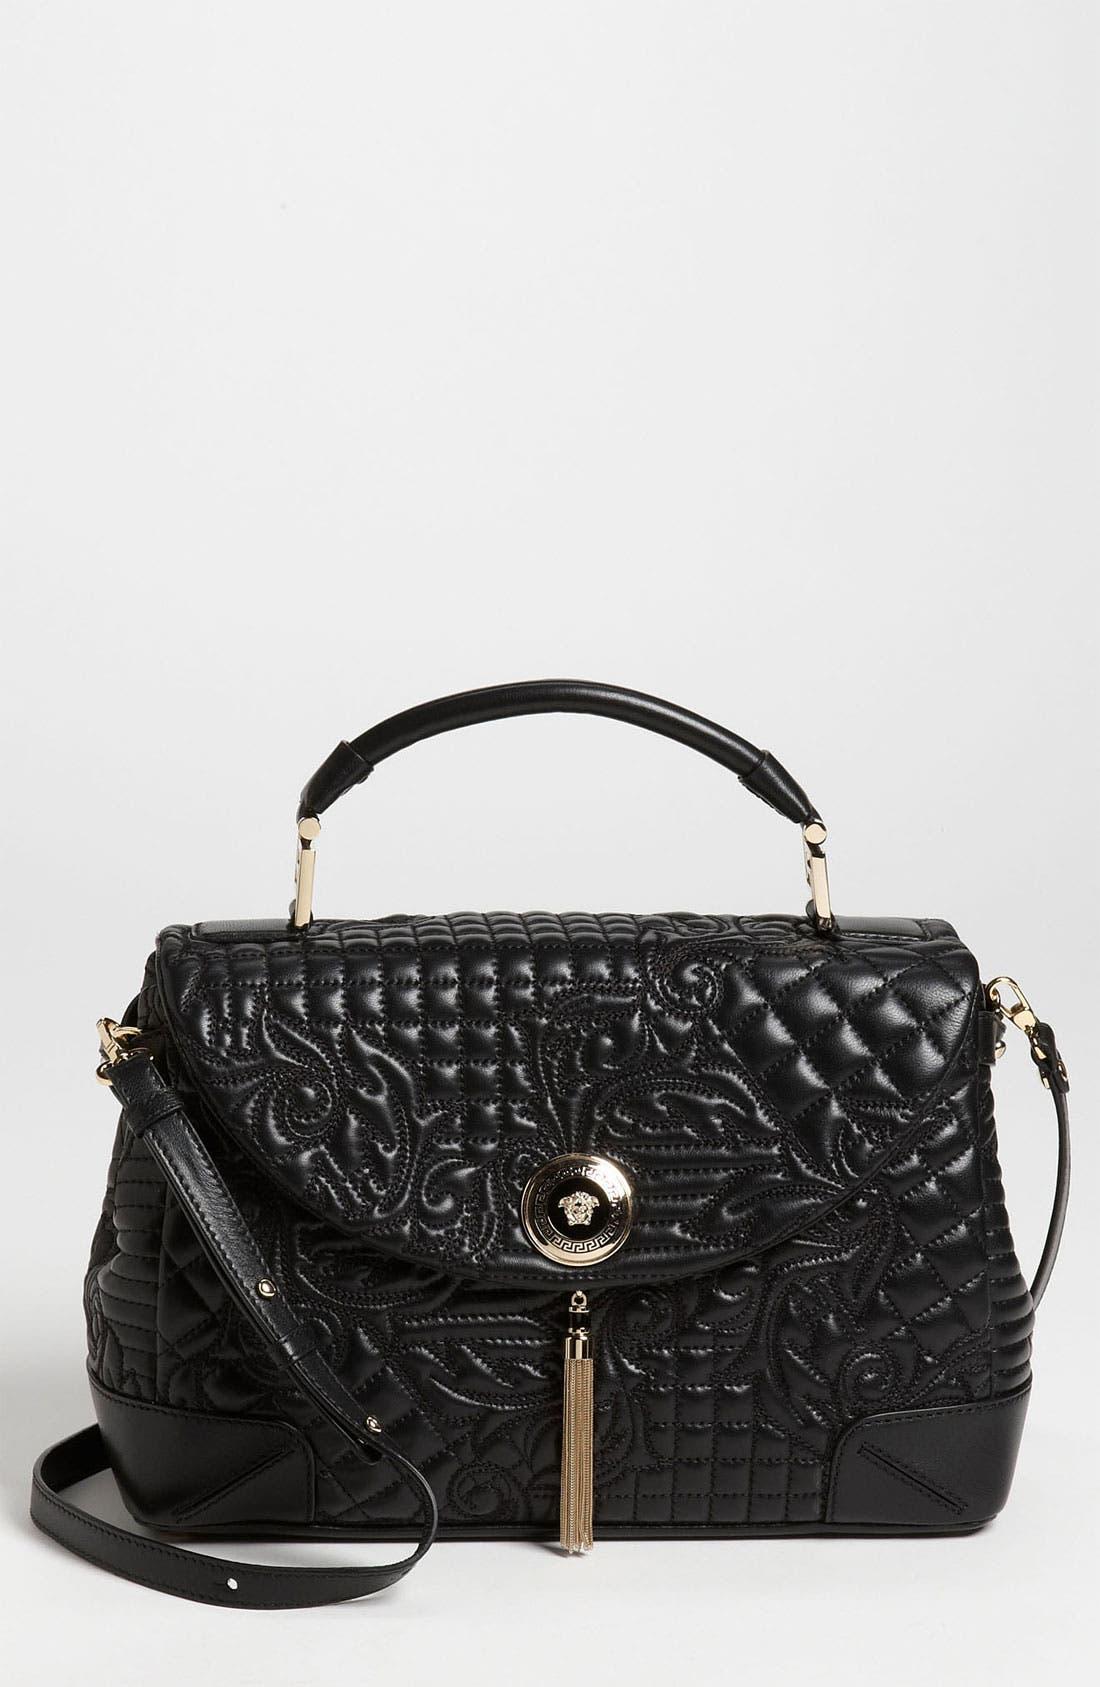 Alternate Image 1 Selected - Versace 'Vanitas' Embroidered Nappa Lambskin Leather Satchel